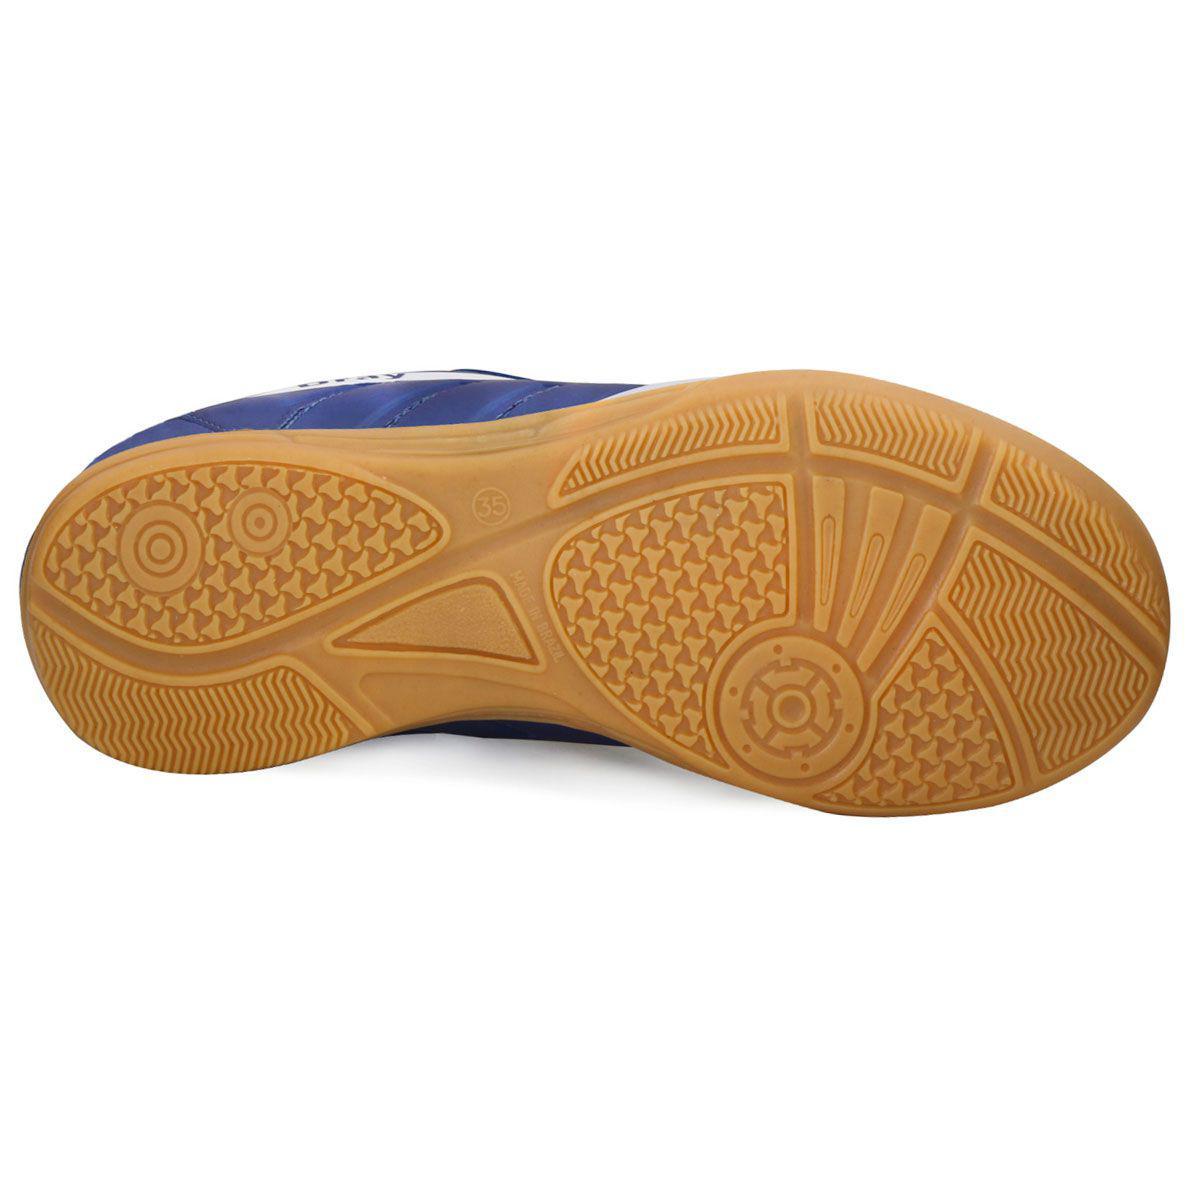 4ce6368079de9 Chuteira Futsal Dray Topfly IV Infantil 363 - Marinho Ouro - Tênis ...